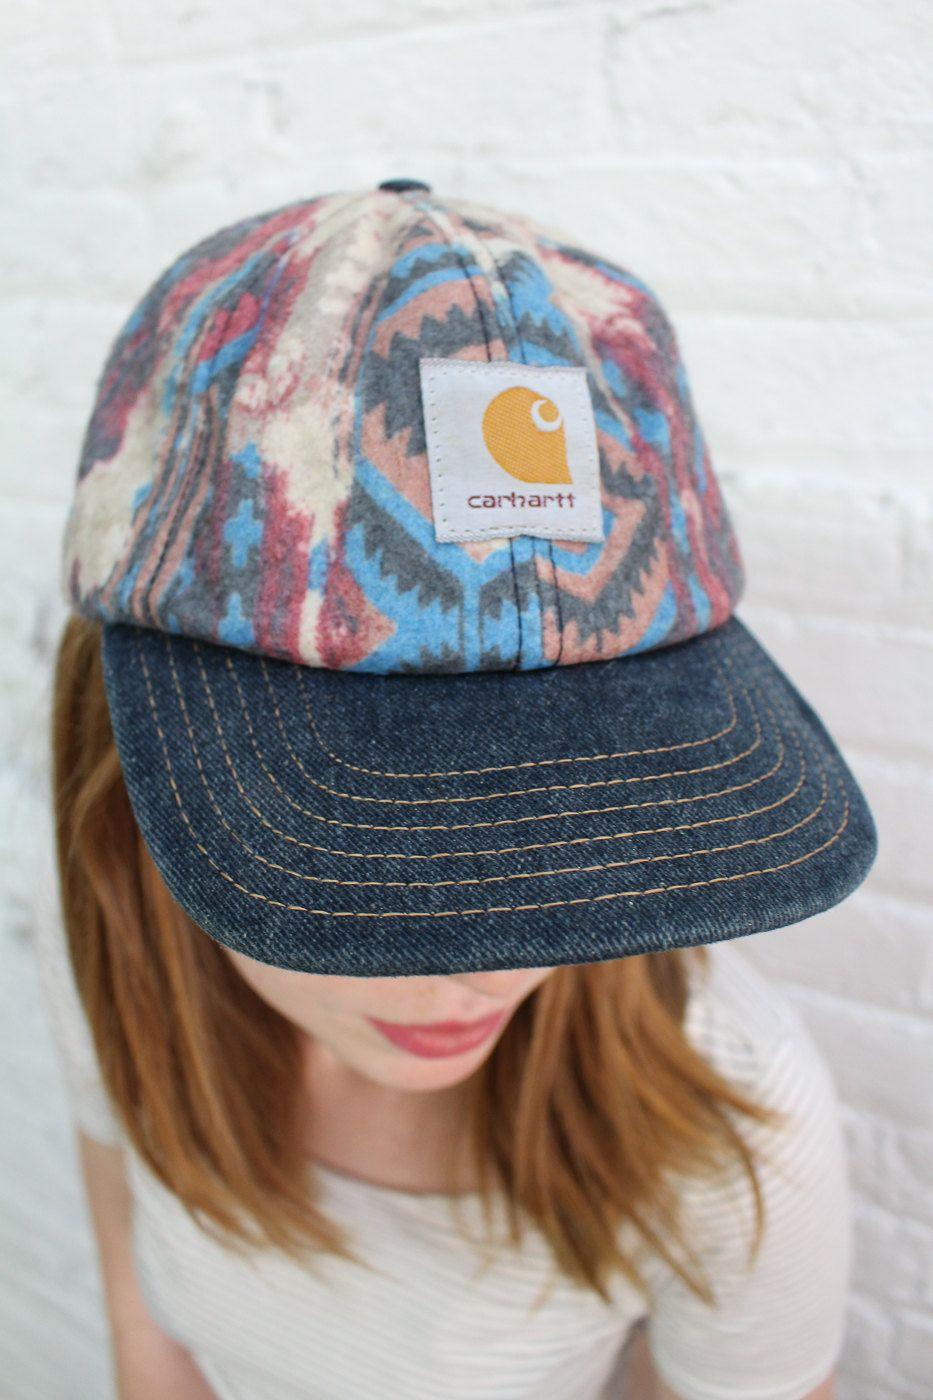 vintage Carhartt hat   flannel baseball hat with aztec print   denim brim    workwear by dustyrosevintage on Etsy 72a6af81f5d8